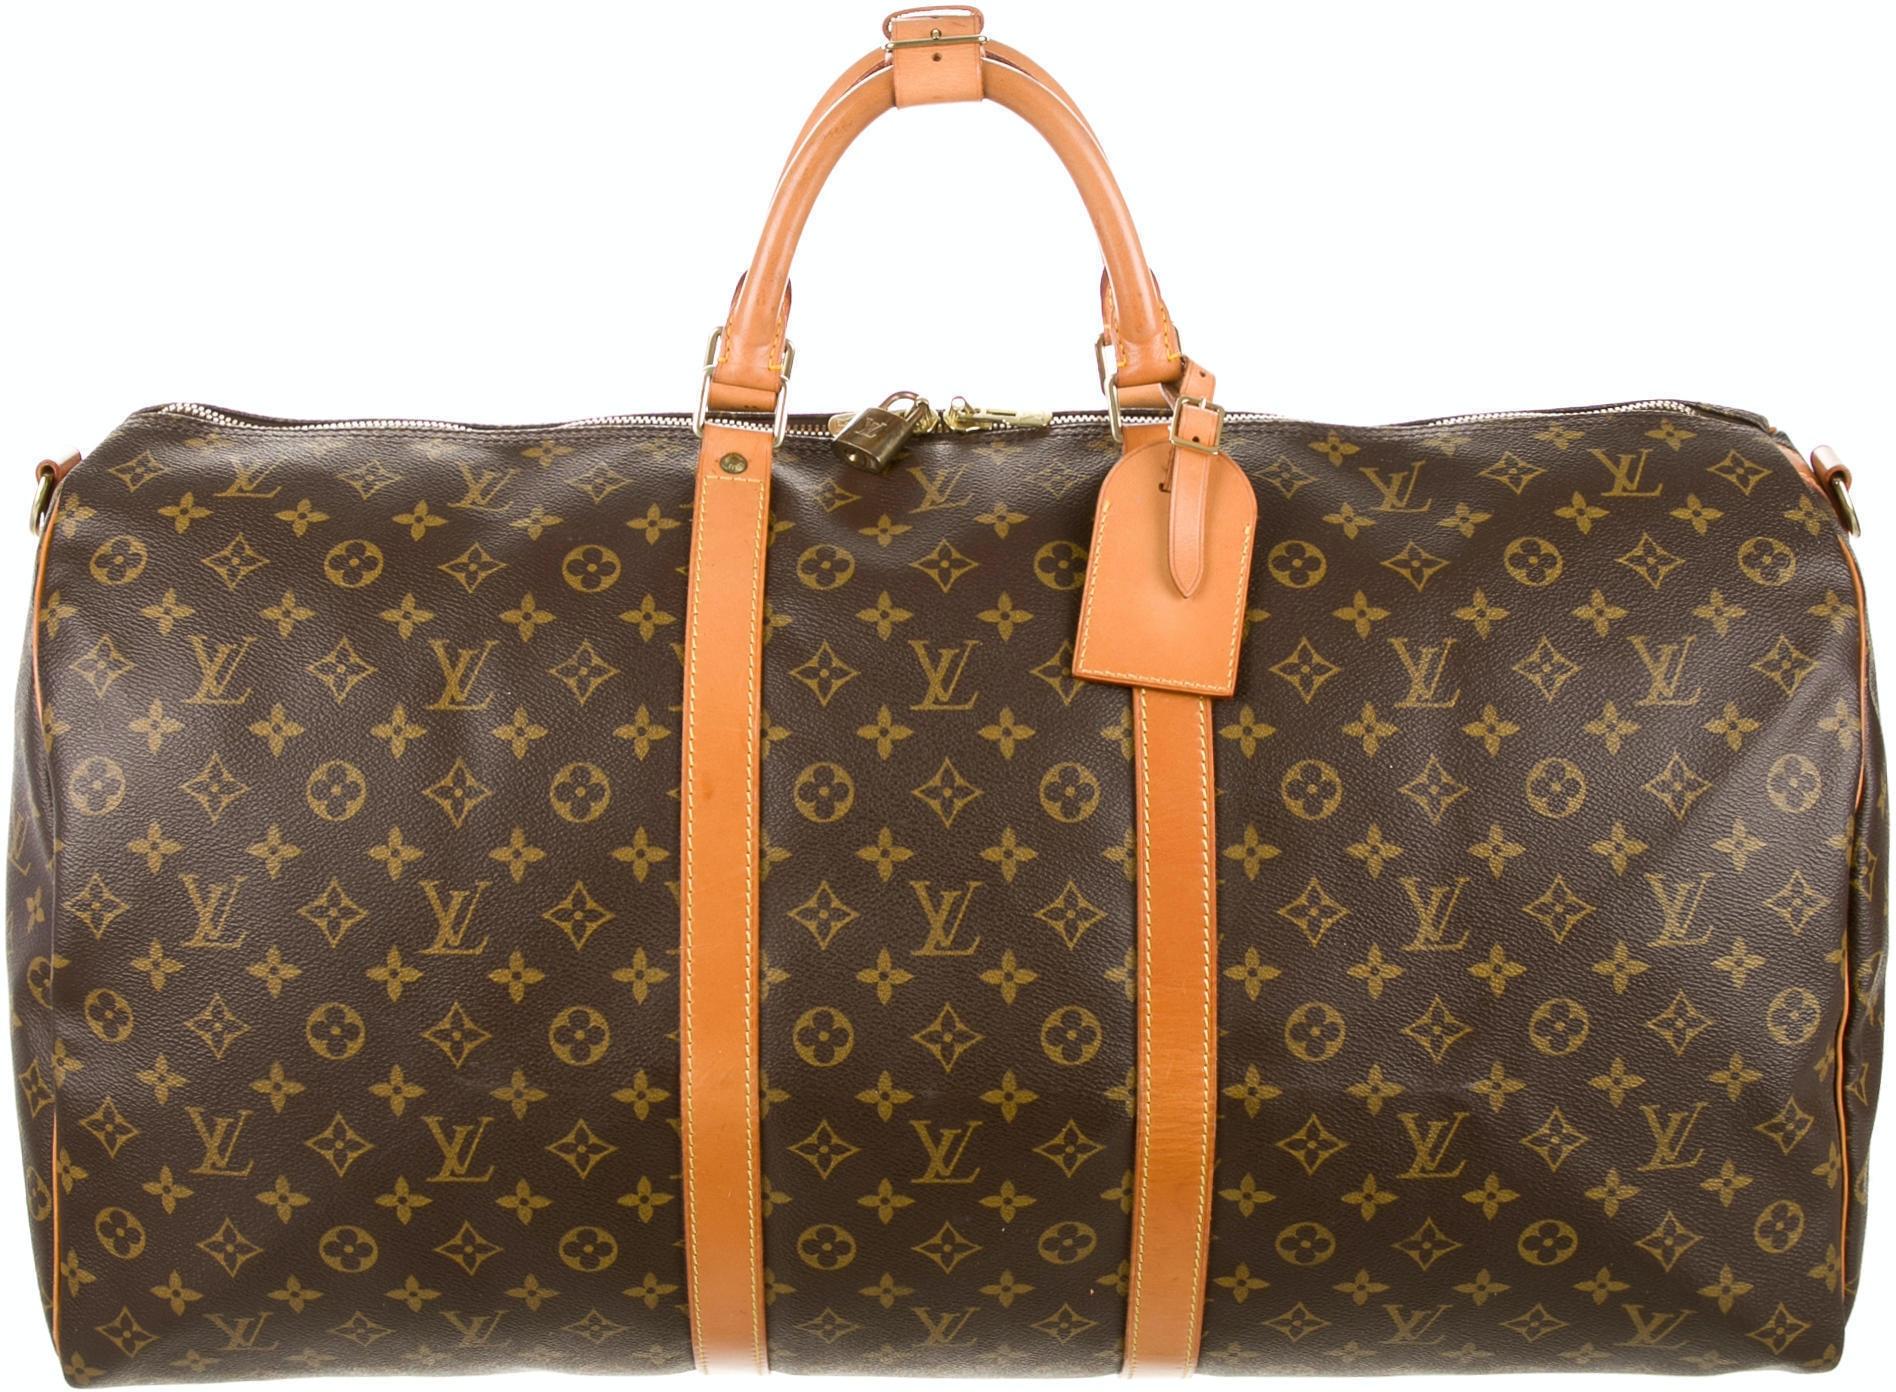 Louis Vuitton Keepall Monogram 60 Brown